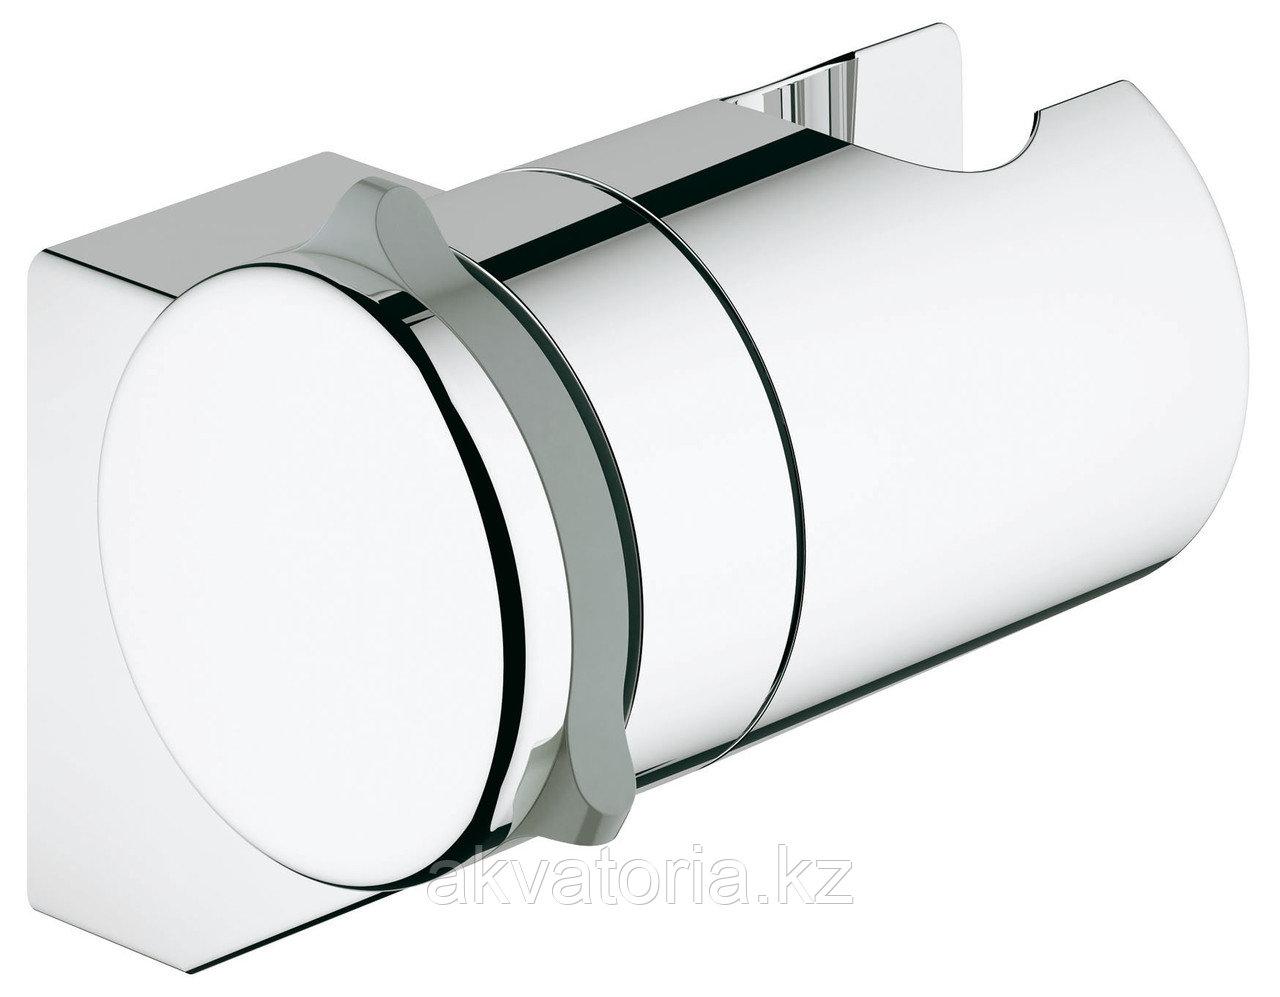 27595000 shower Holder Держатель для душа